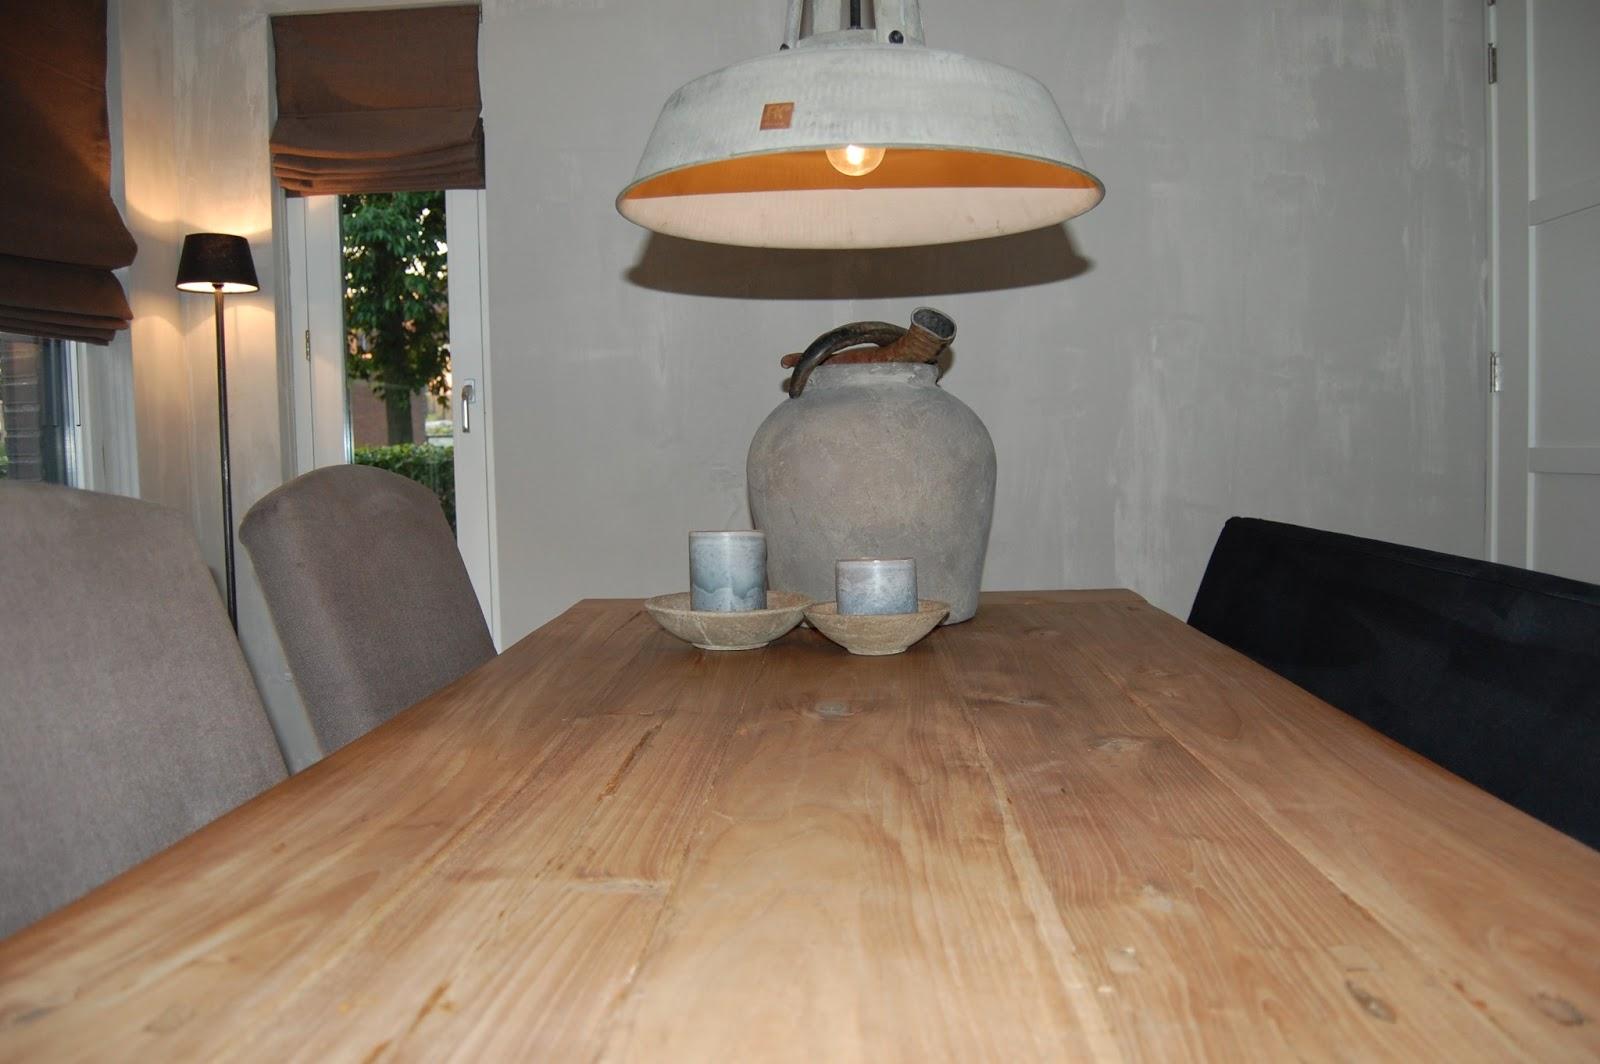 Stoer robuust wonen foto 39 s woonkamer en eetkamer - Eetkamer en woonkamer ...